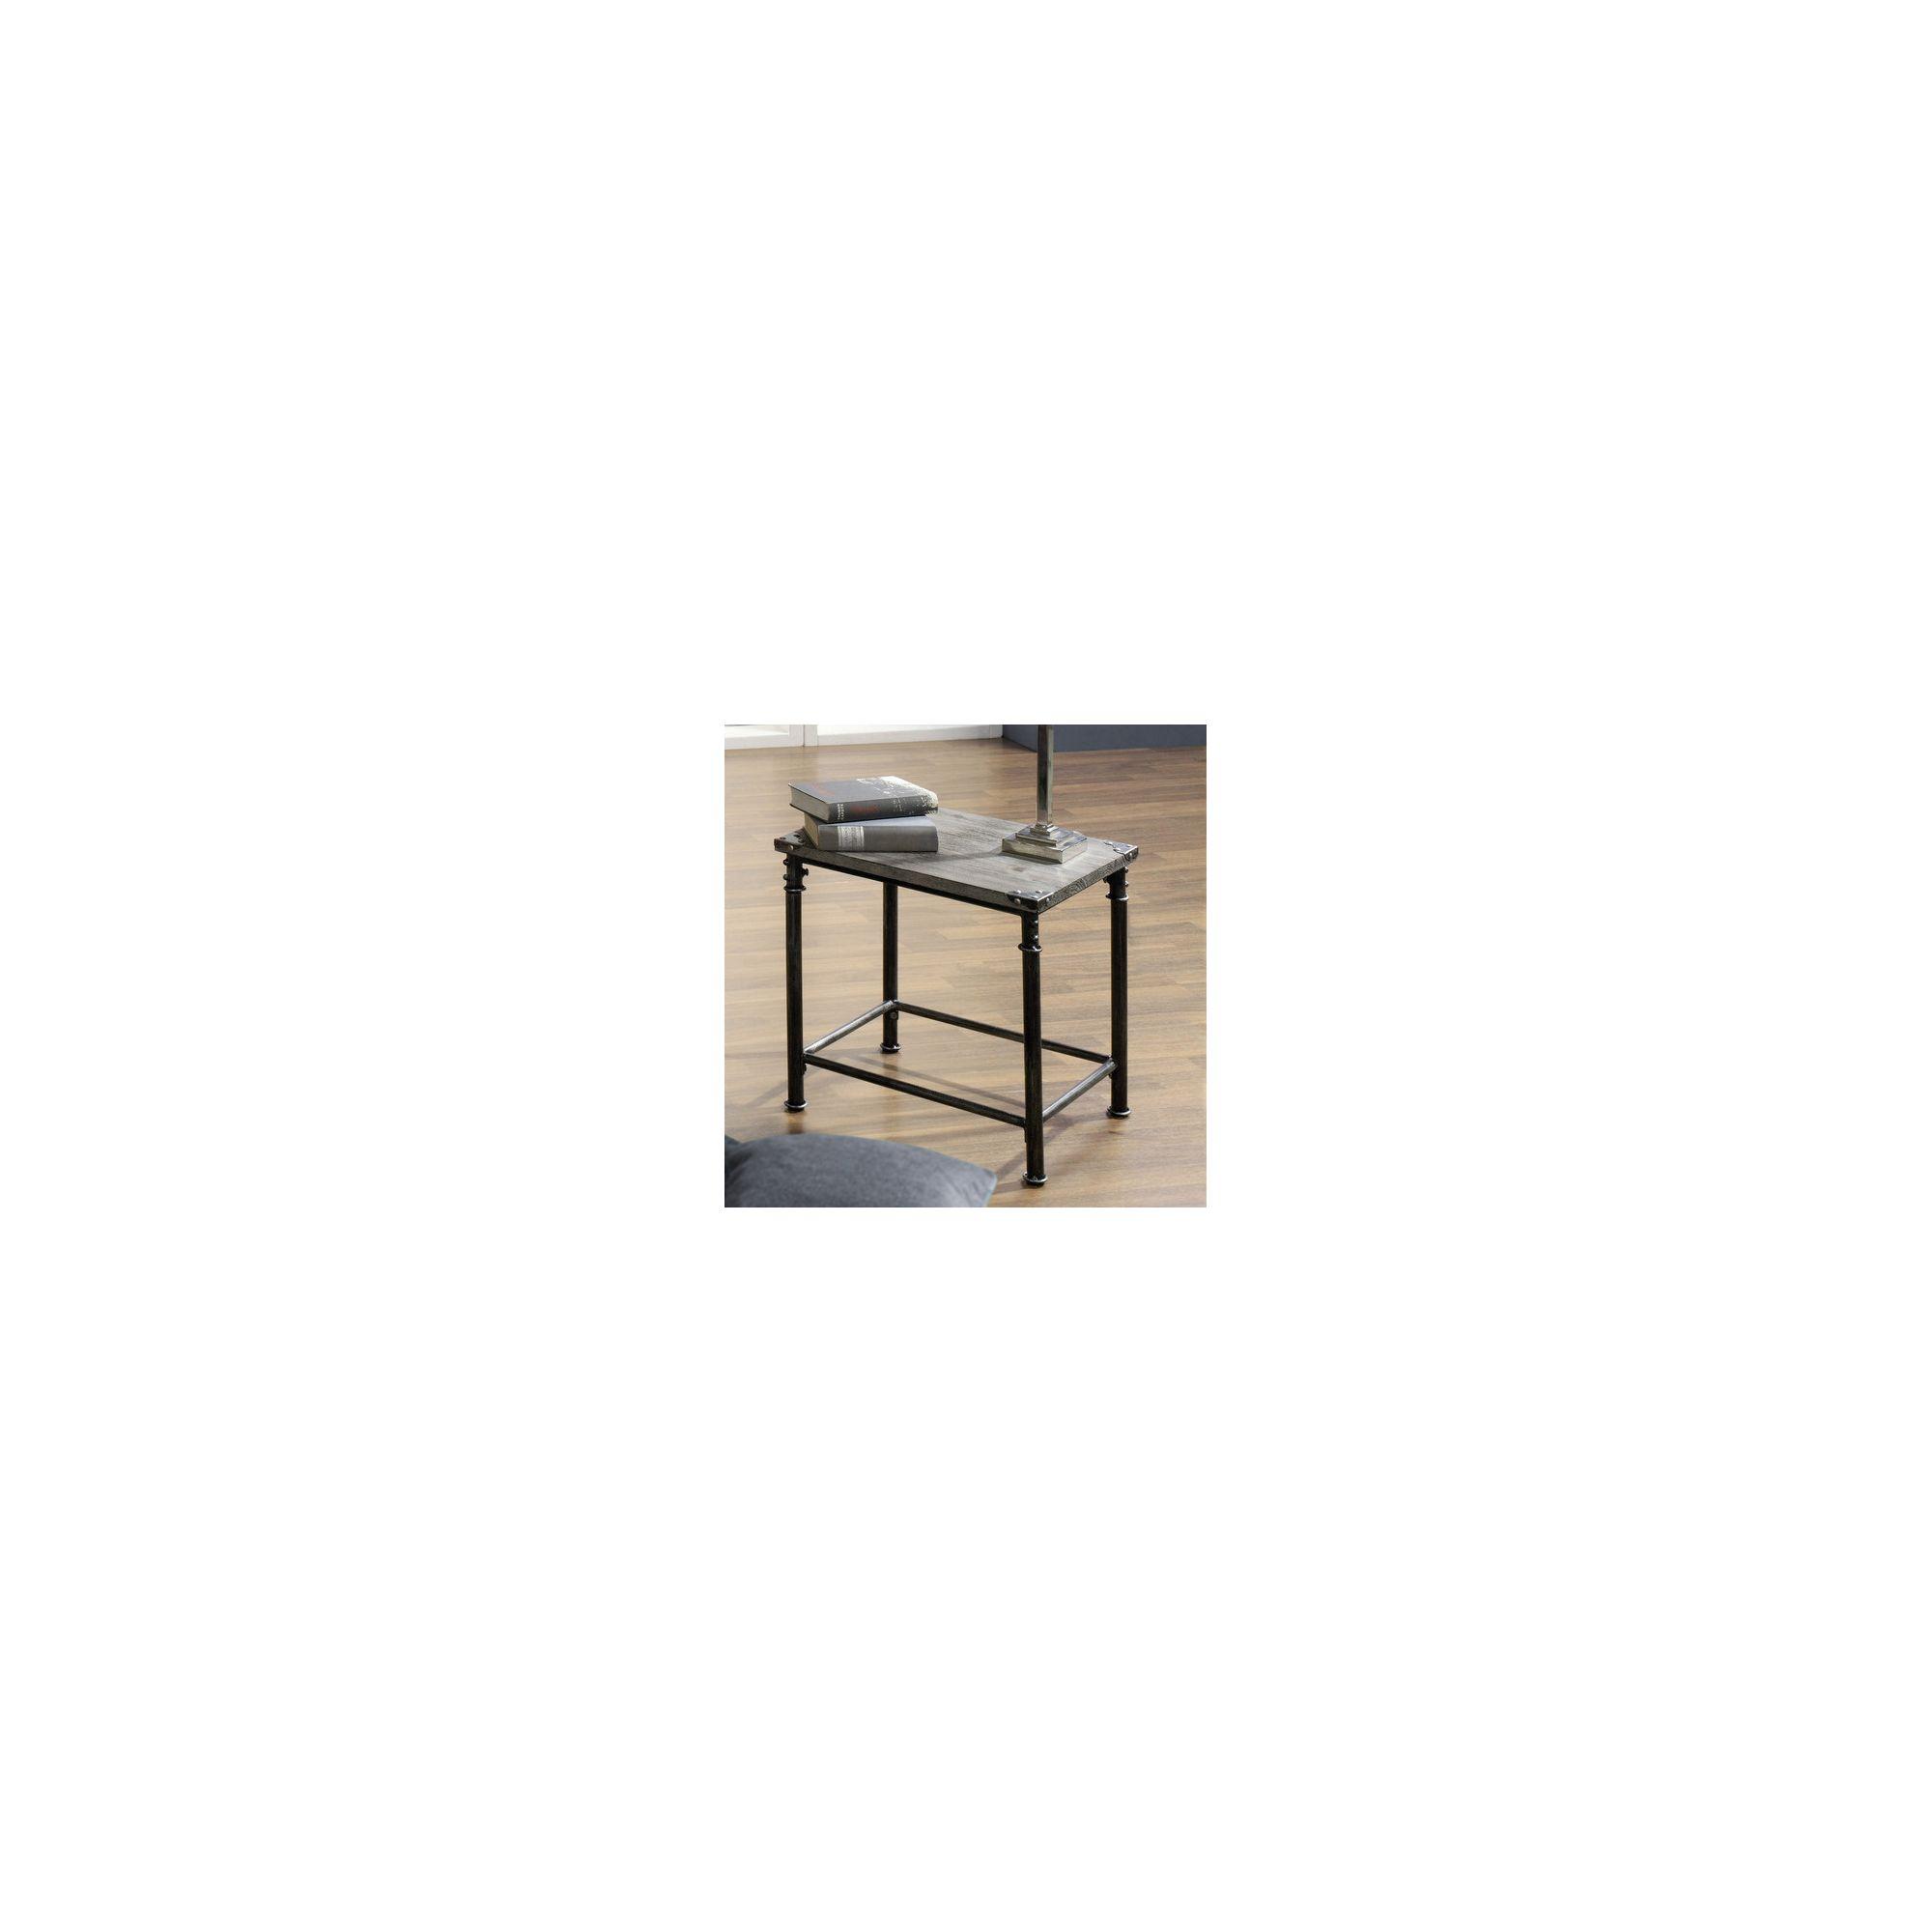 Urbane Designs Side Table - 53 cm H x 52 cm W x 44 cm D